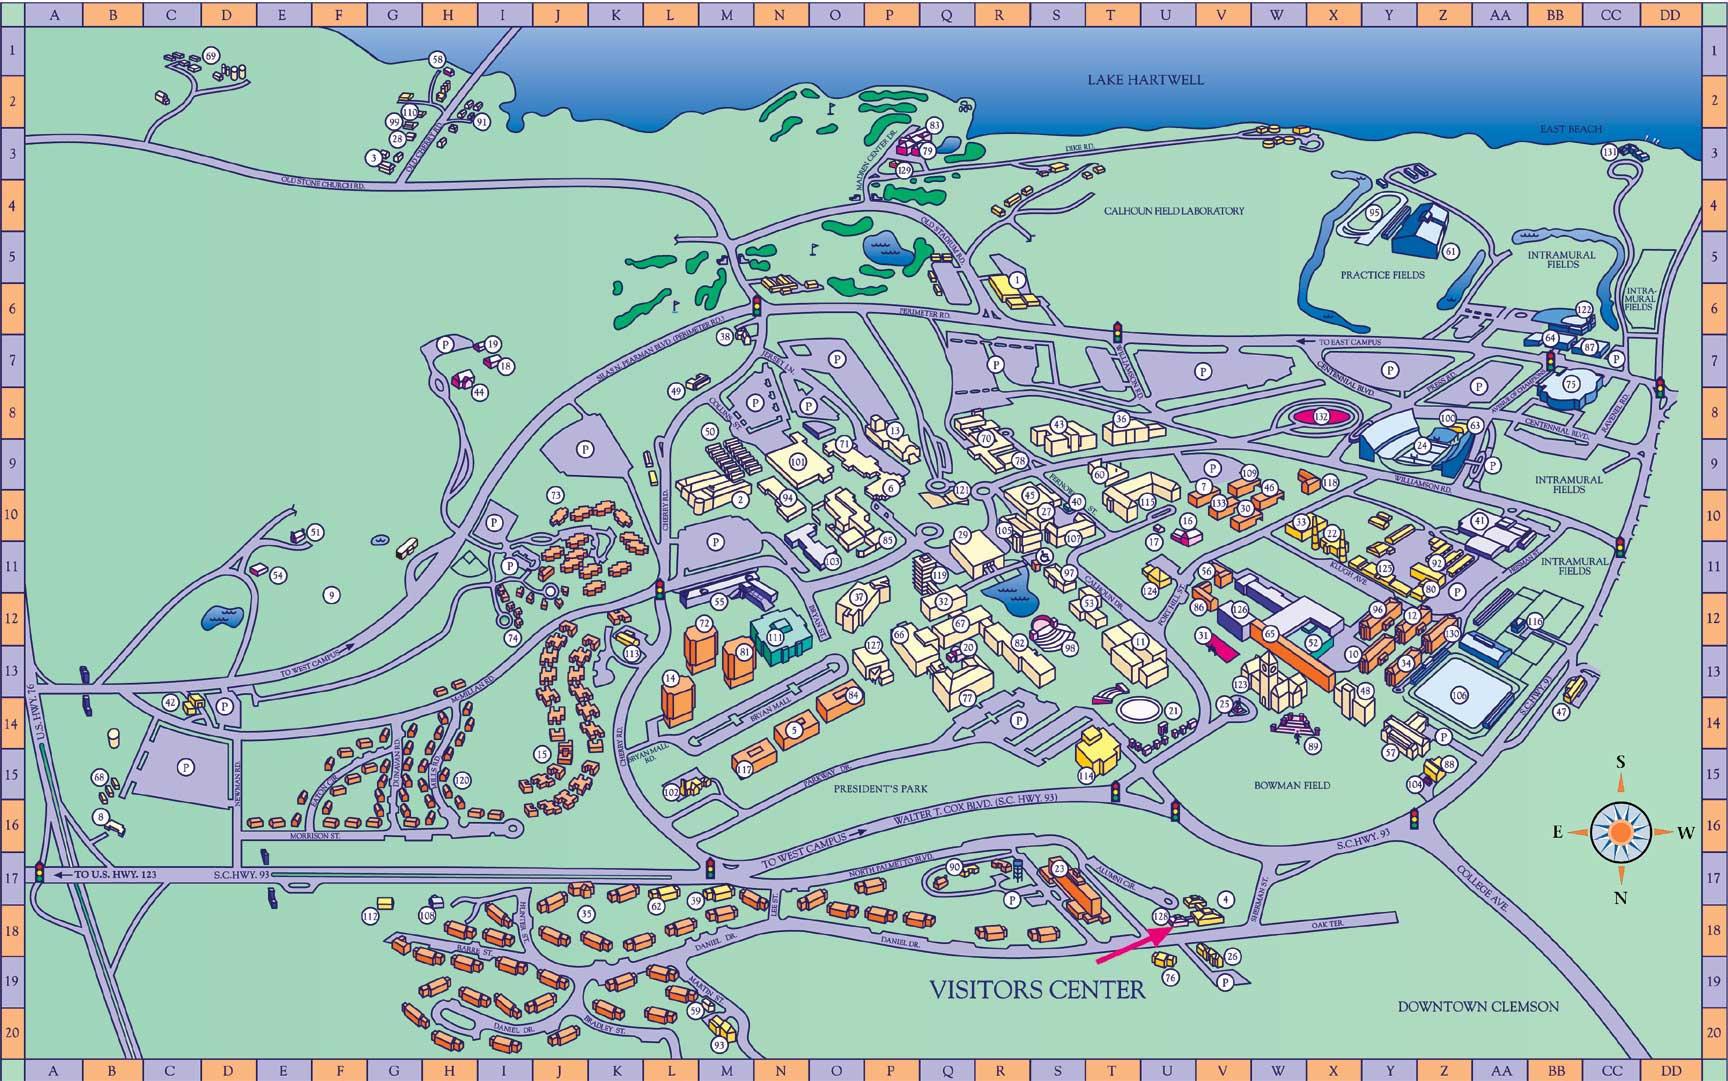 Clemson University Map World Wind Usgs 1m Ortho Visually Sc Botanical Garden 34 6737189 82 8214463 Not Used Practice Fields 6744904